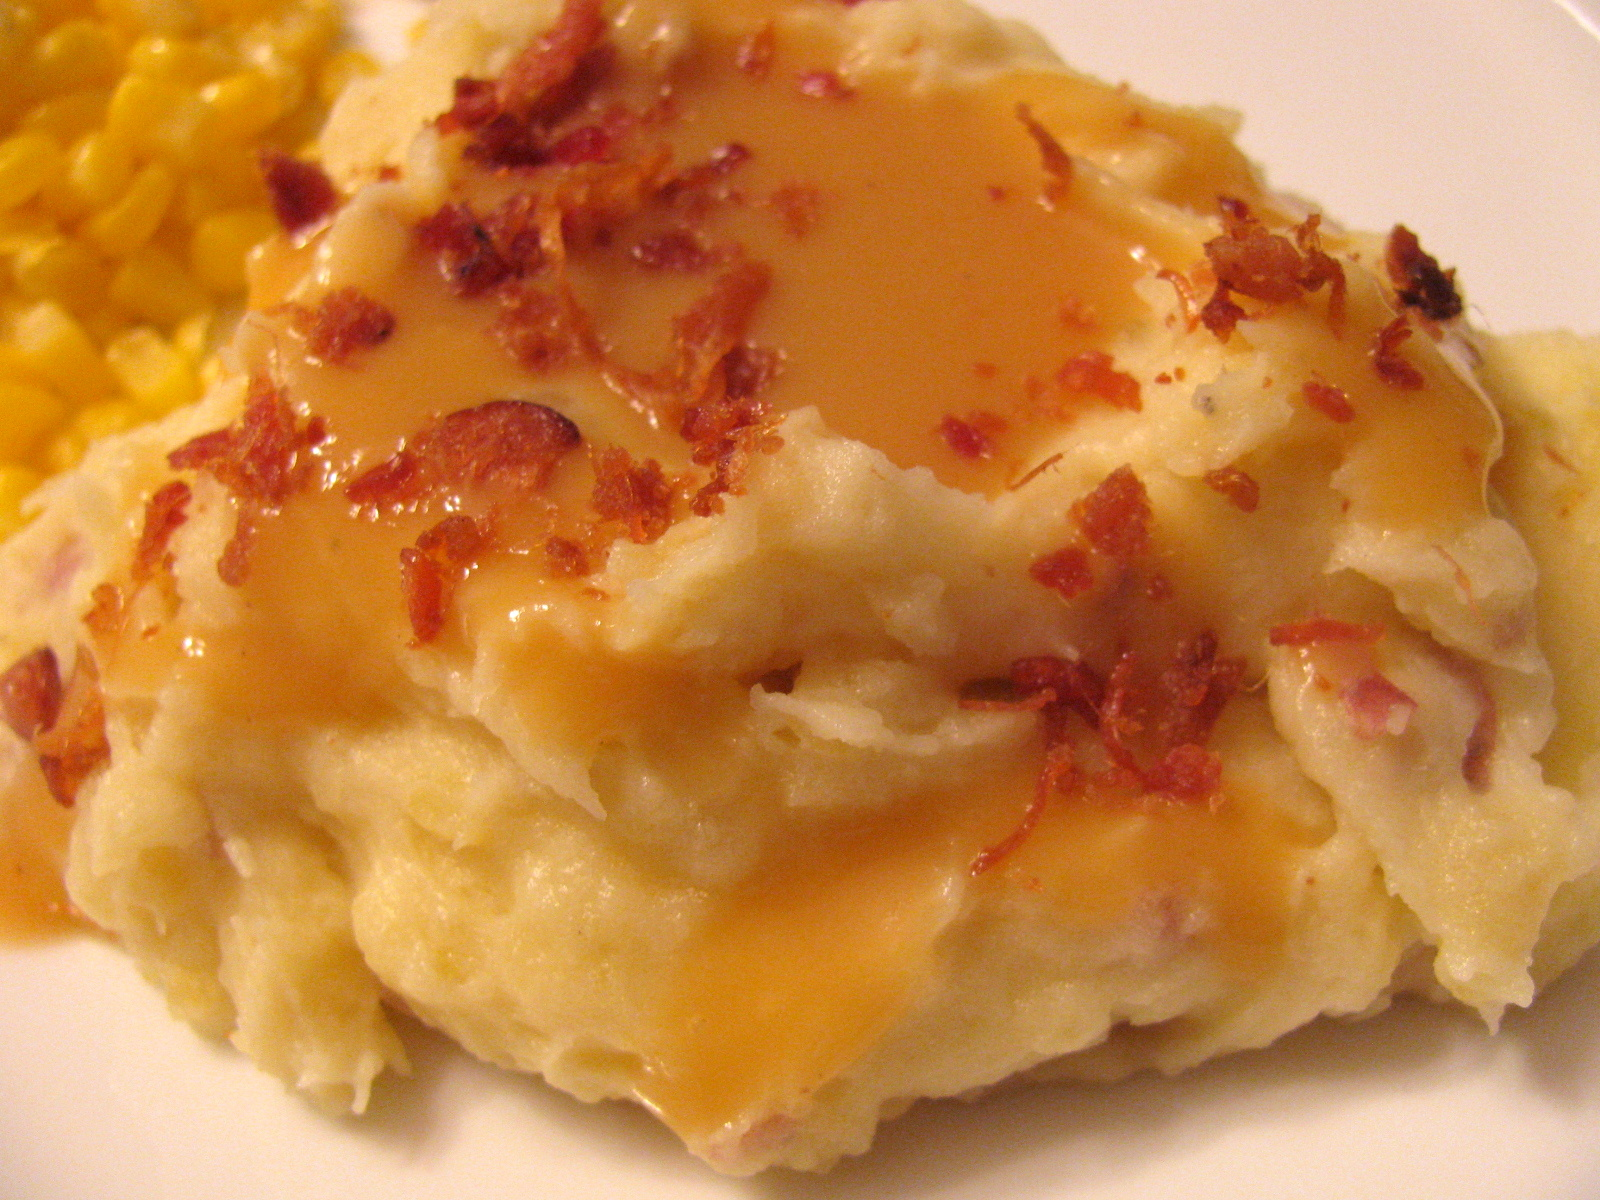 Parmesan and Garlic Mashed Red Potatoes